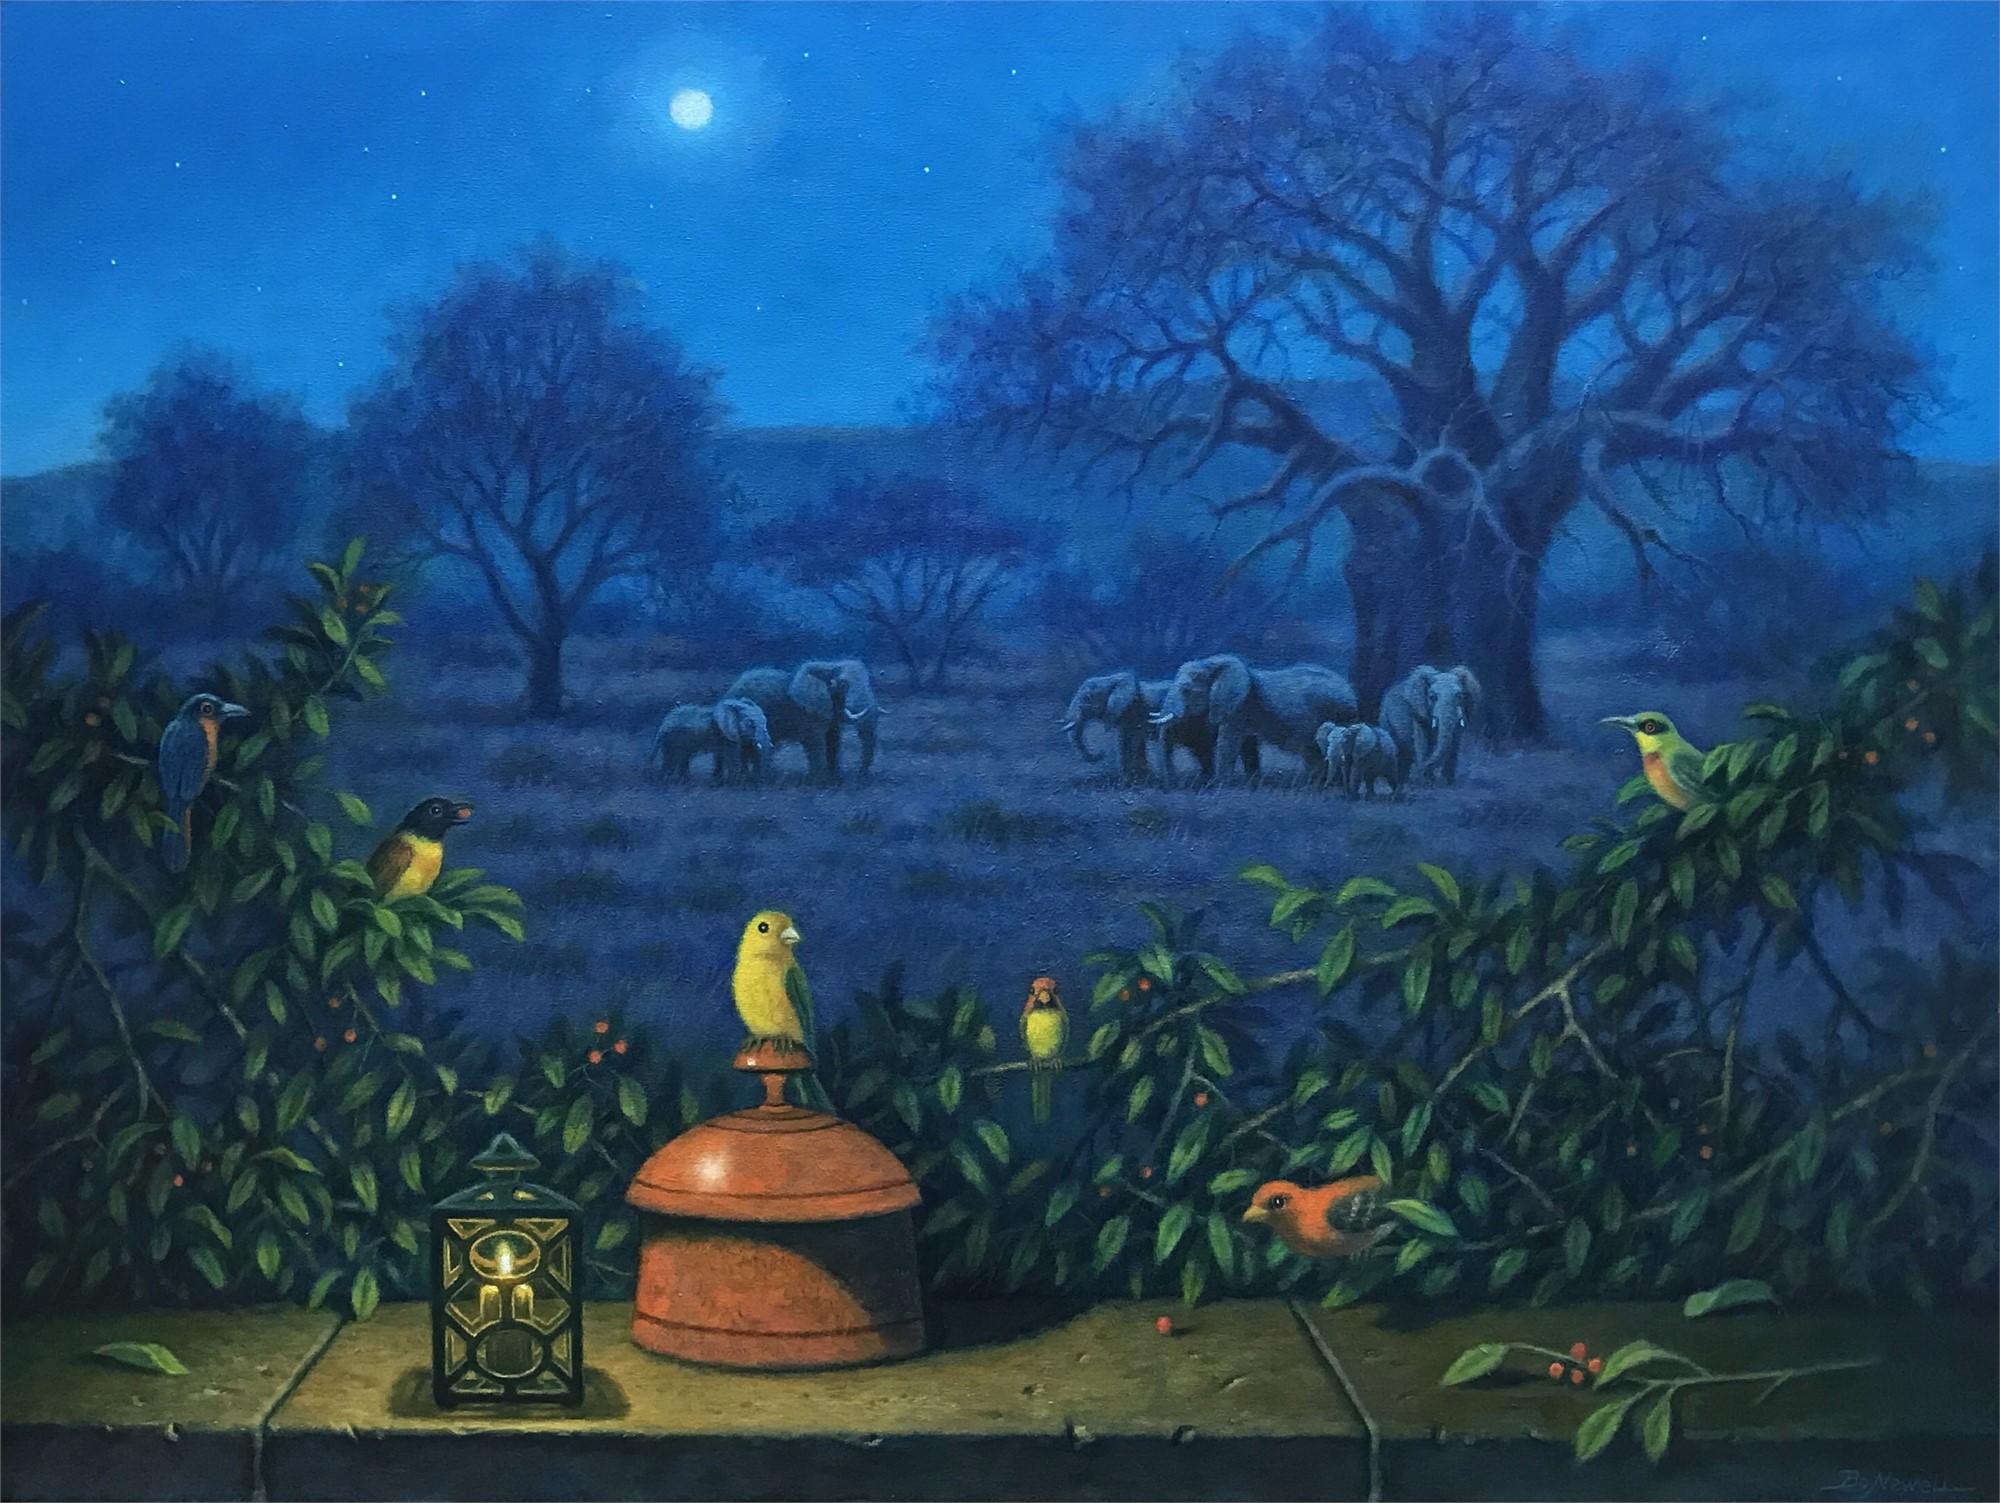 Moonlight by Bo Newell